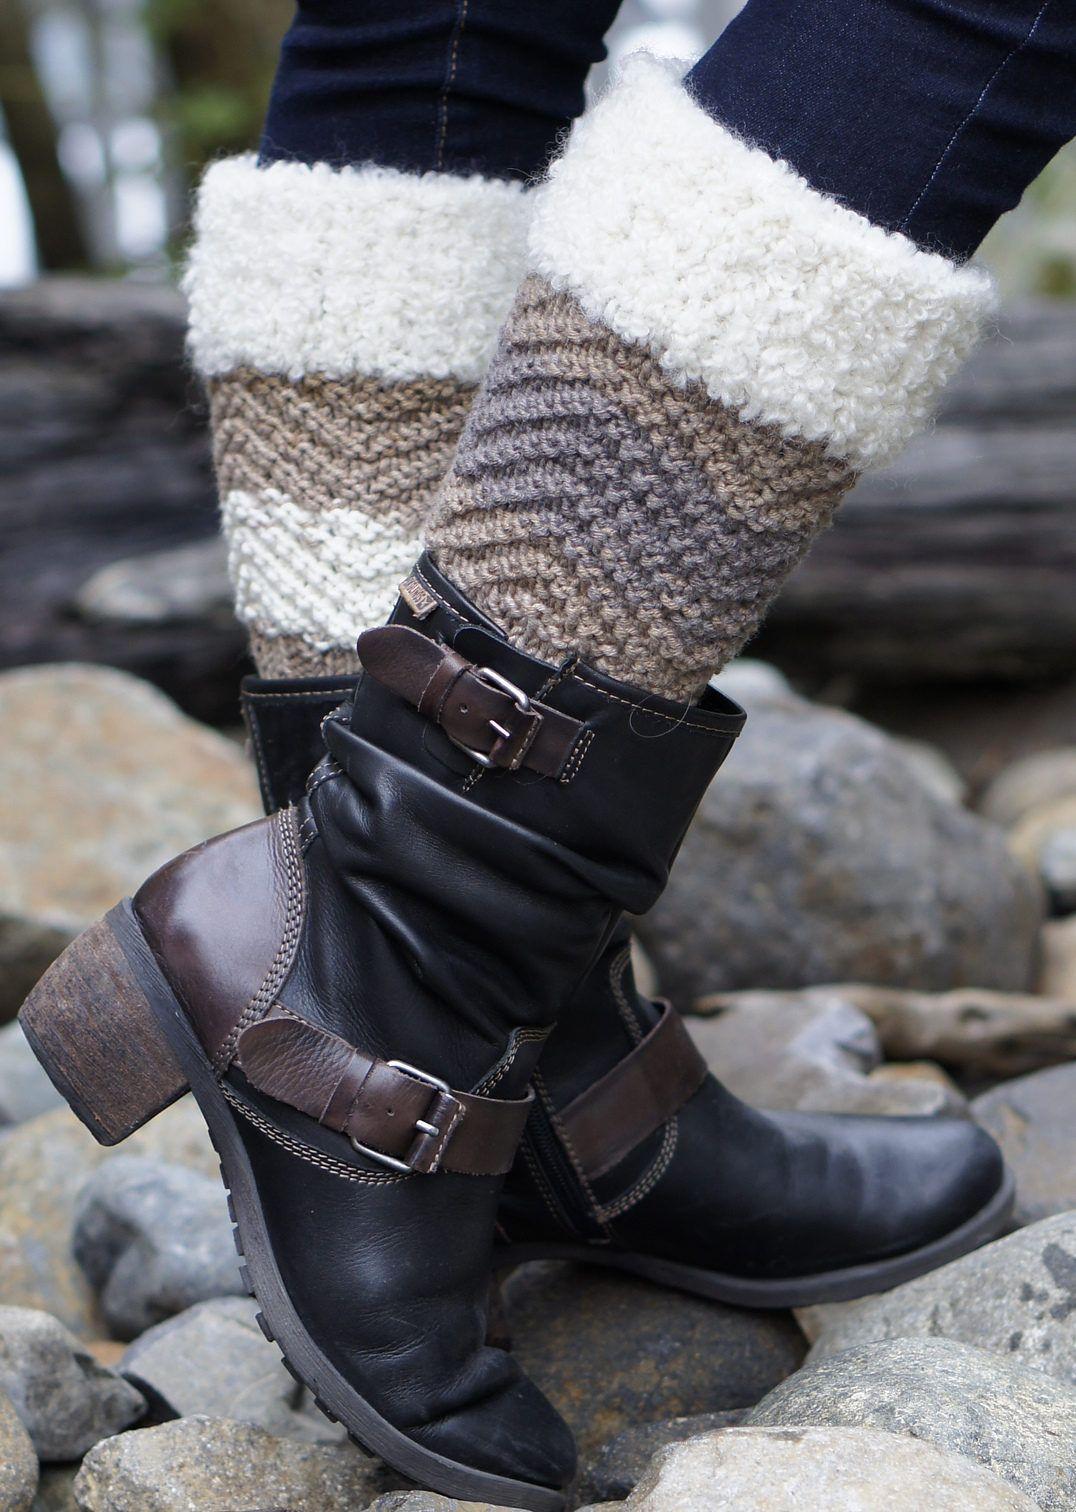 Free knitting pattern for baa baa boot cuffs boot toppers knit free knitting pattern for baa baa boot cuffs boot toppers knit in 4 row bankloansurffo Gallery